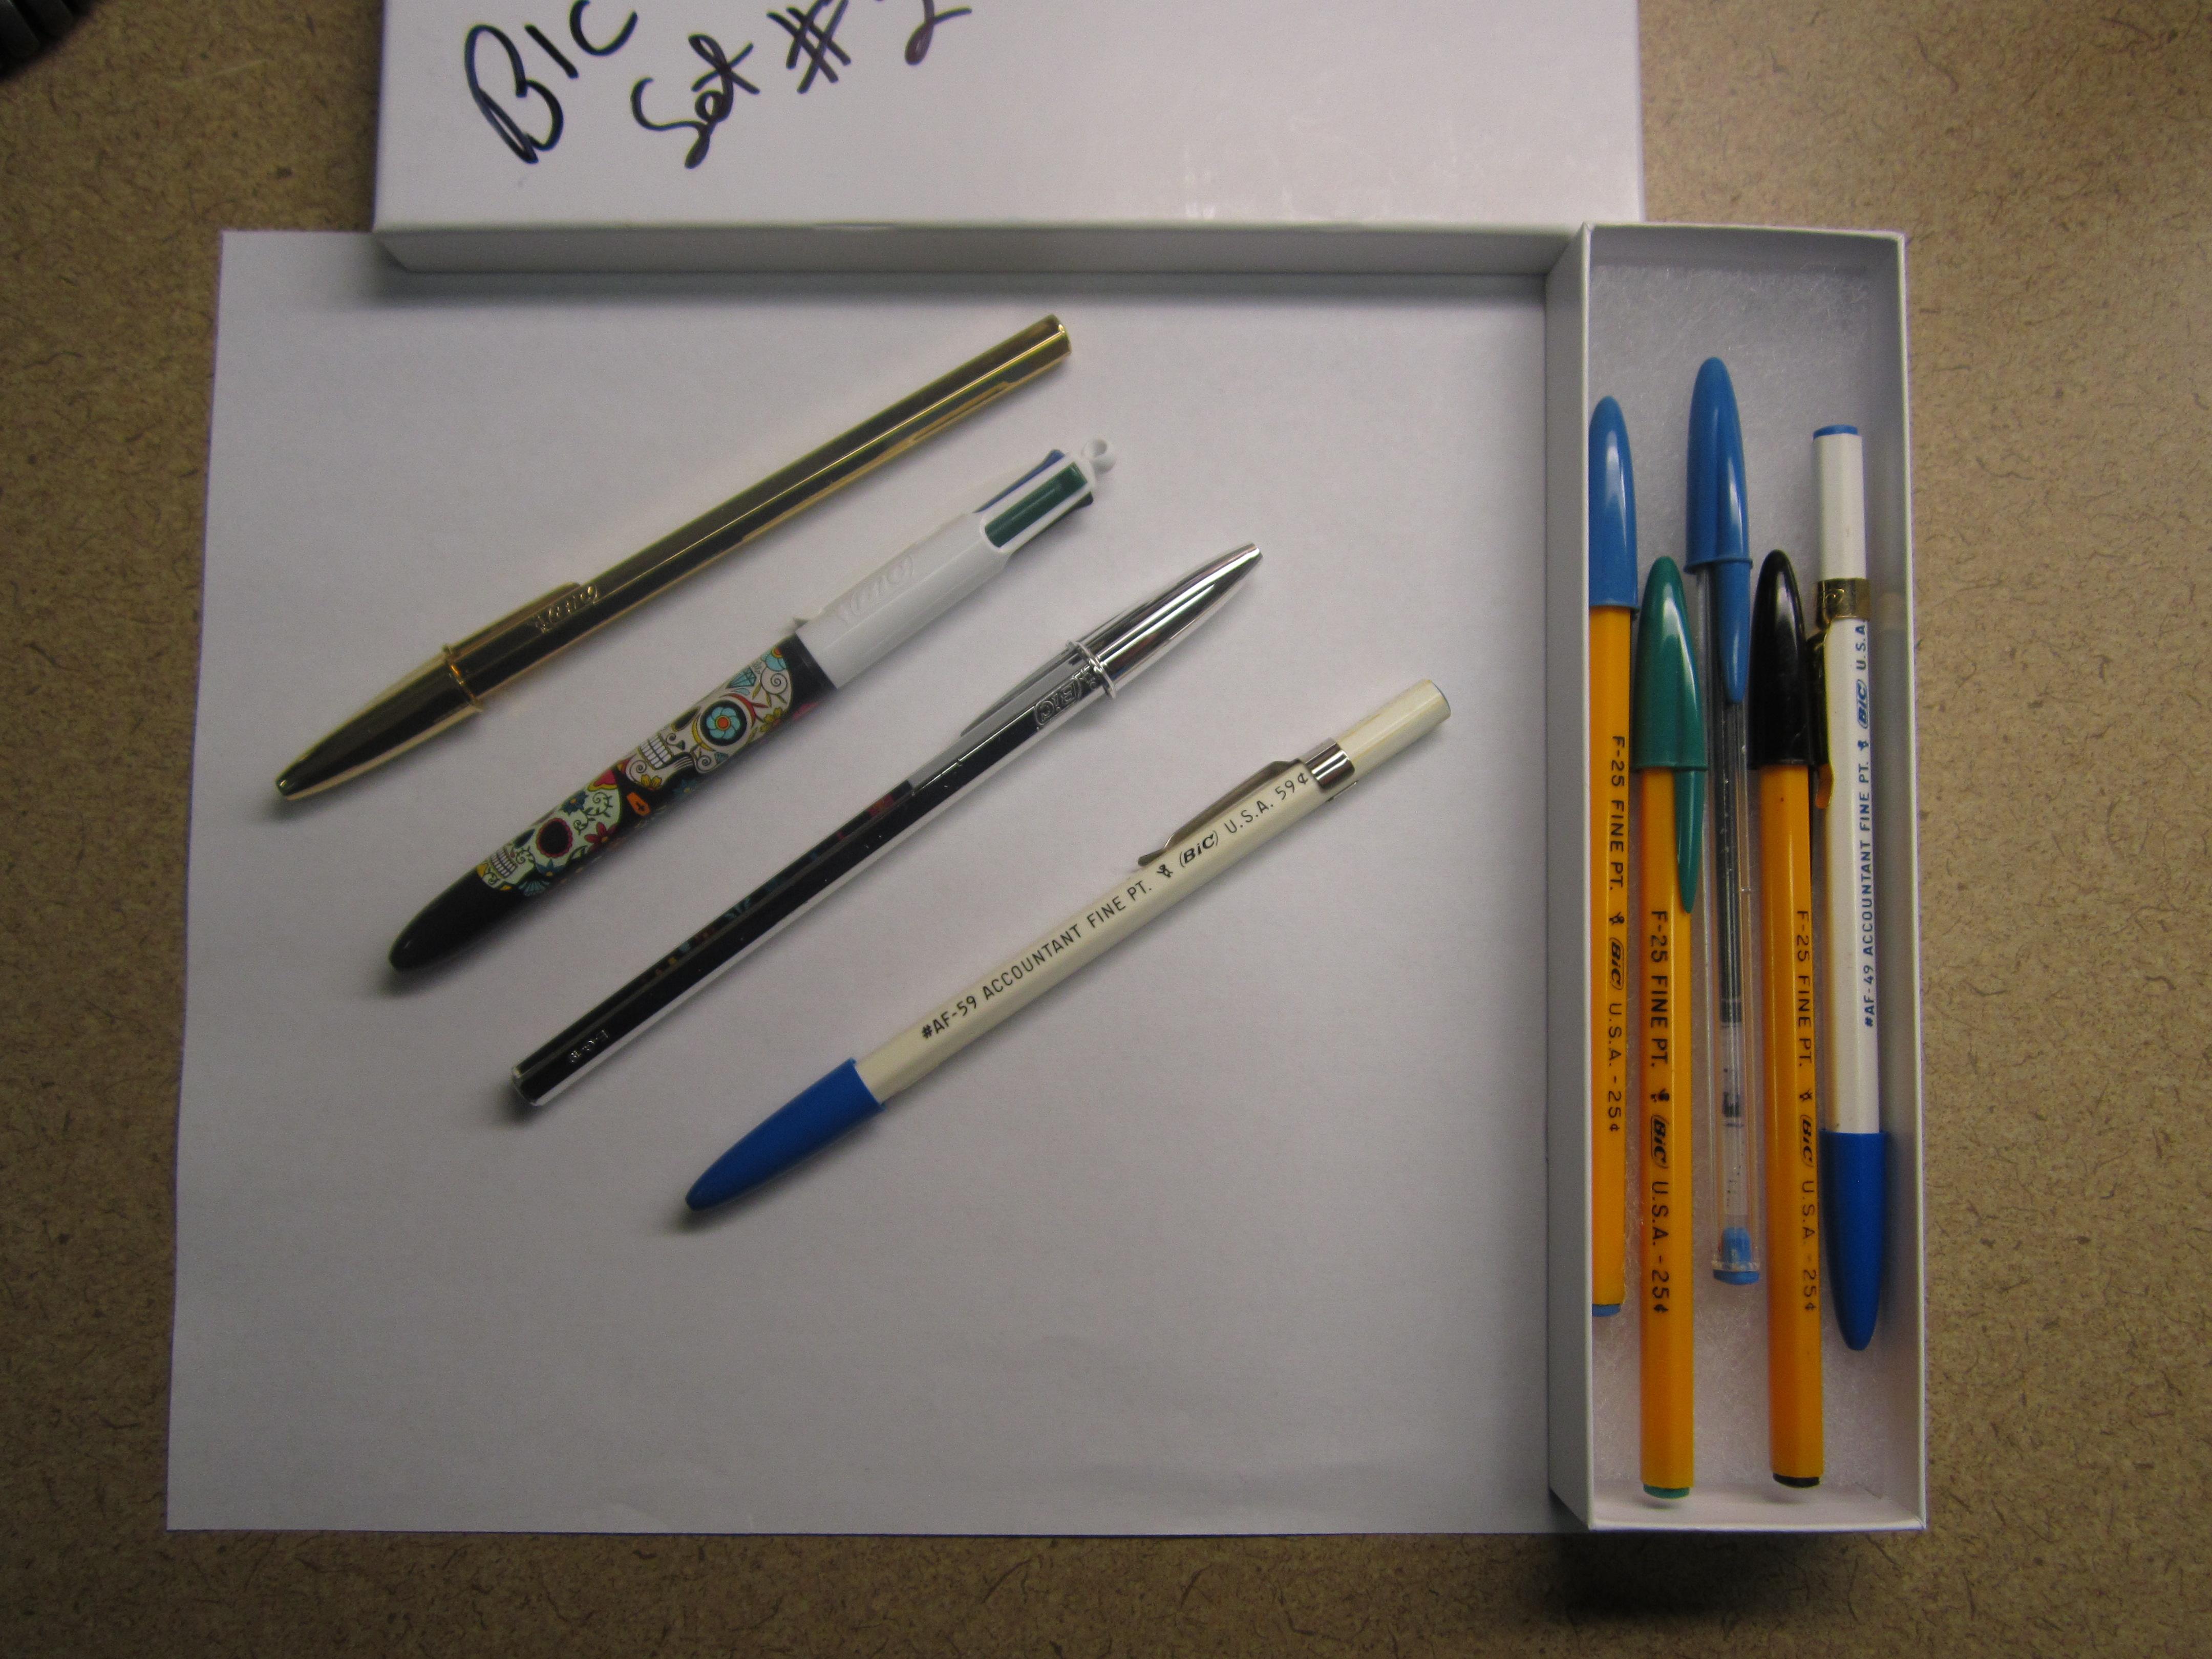 Hot sale fluorescent liquid chalk marker pen led writing board fluorescent  pen